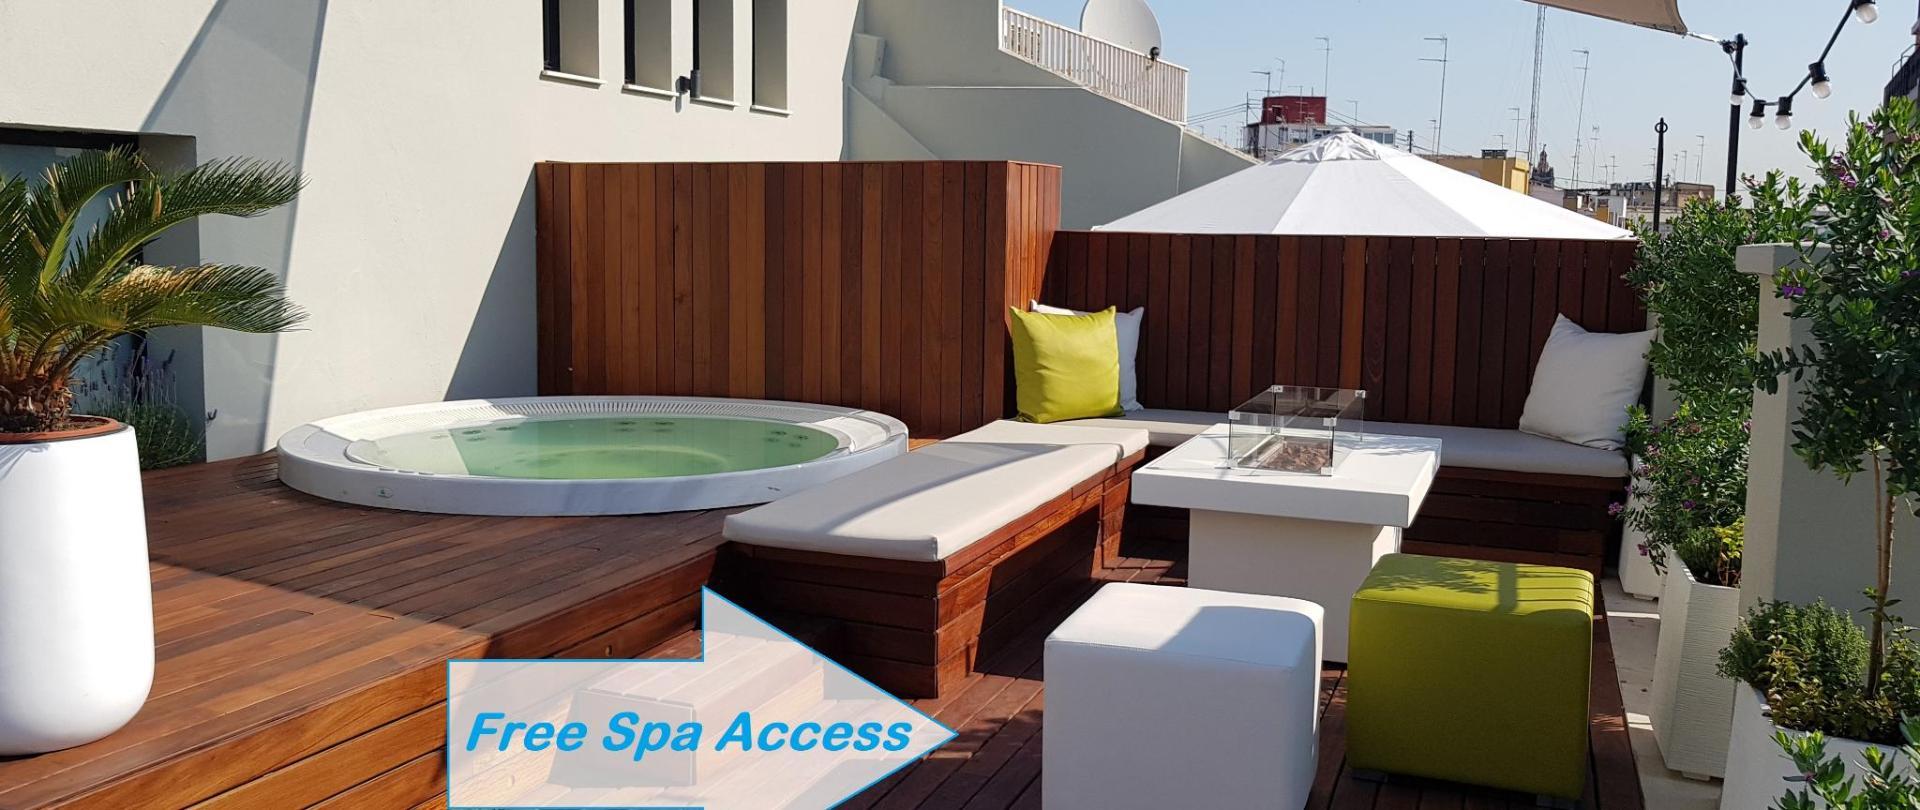 BONNIES Suites & Spa Valencia